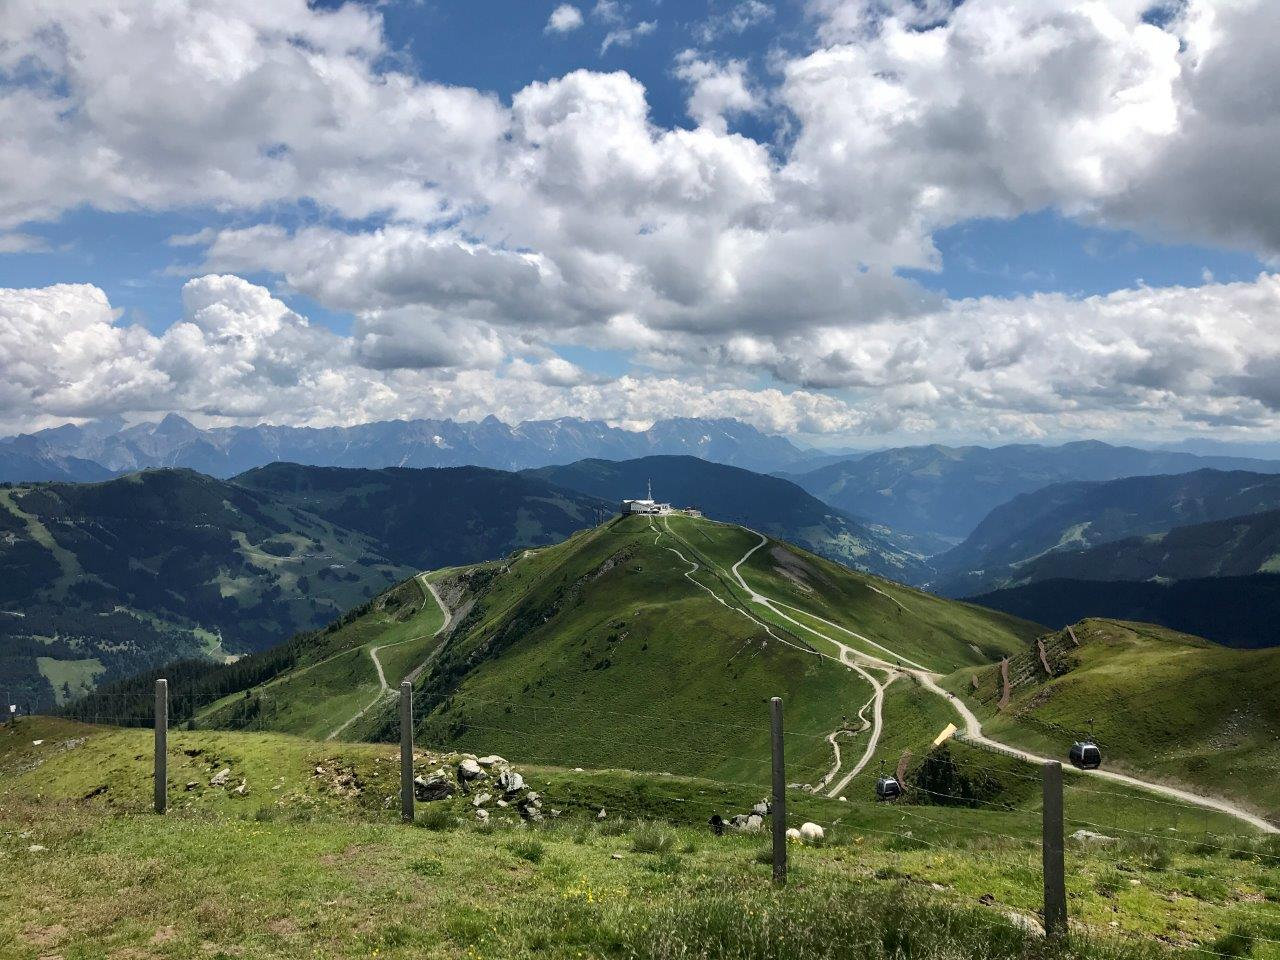 Christian Stern: Familienurlaub 2020 in Hinterglemm